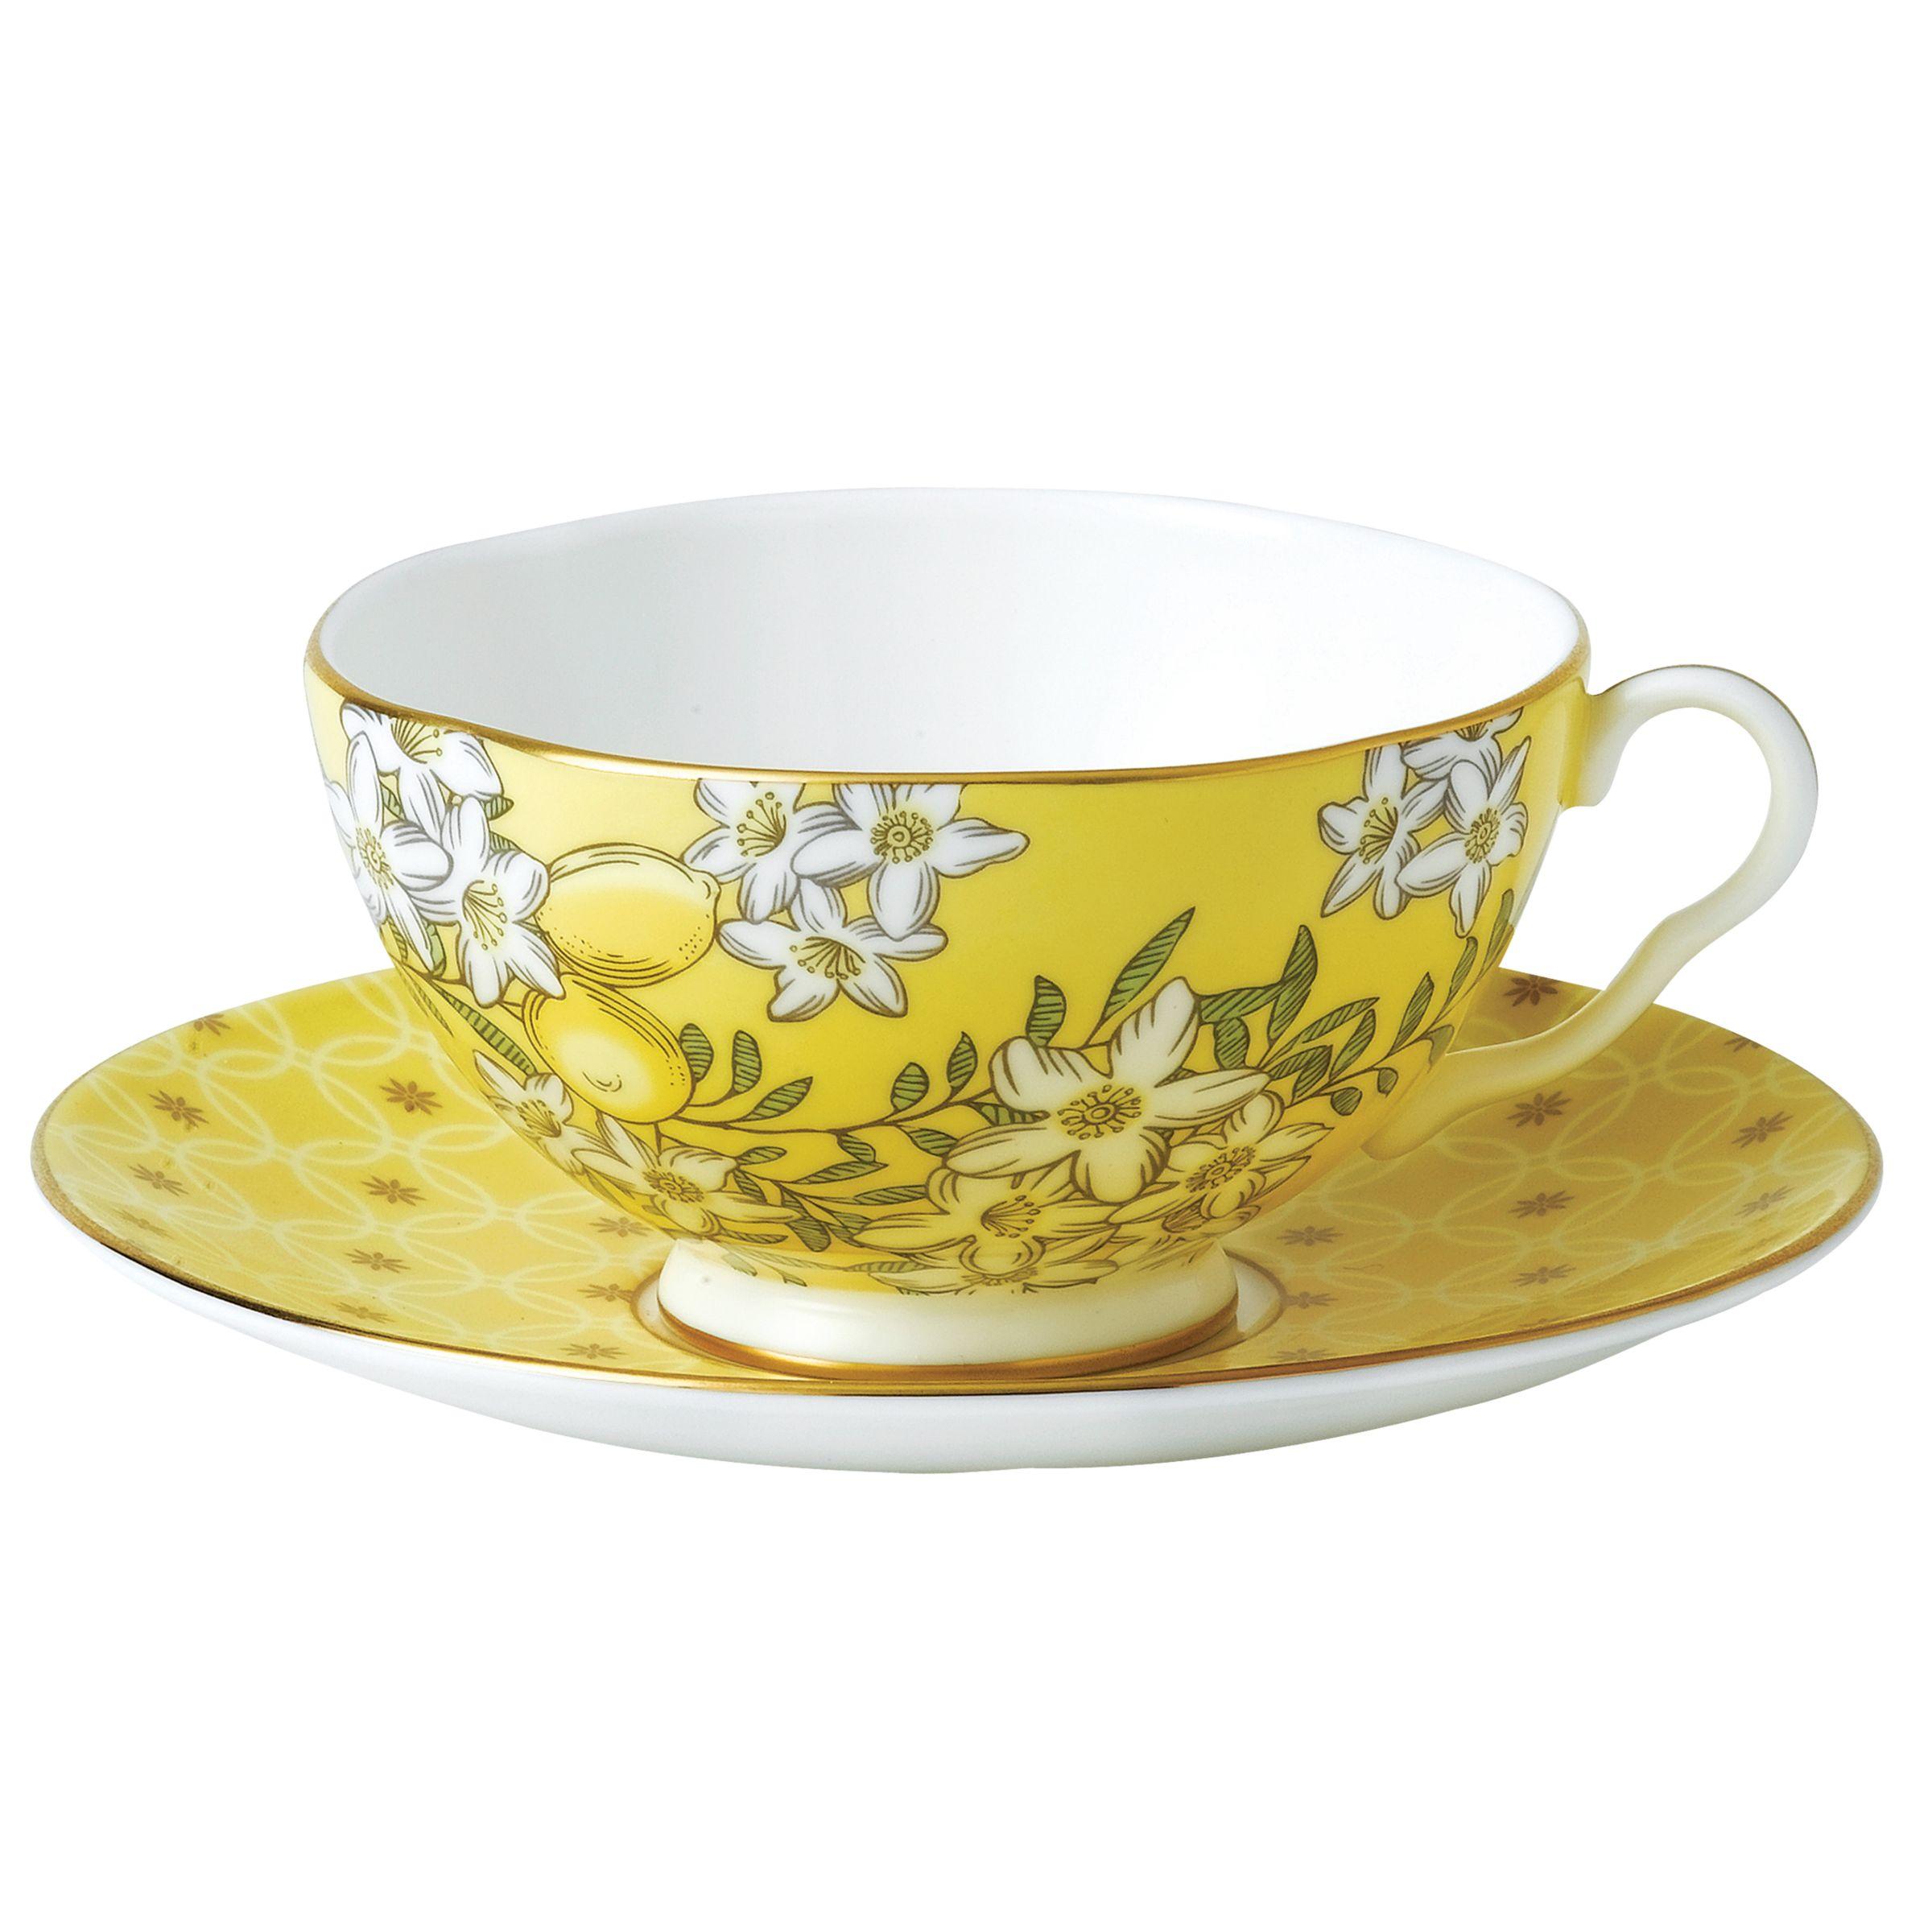 Wedgwood Wedgwood Tea Garden Lemon & Ginger Teacup & Saucer